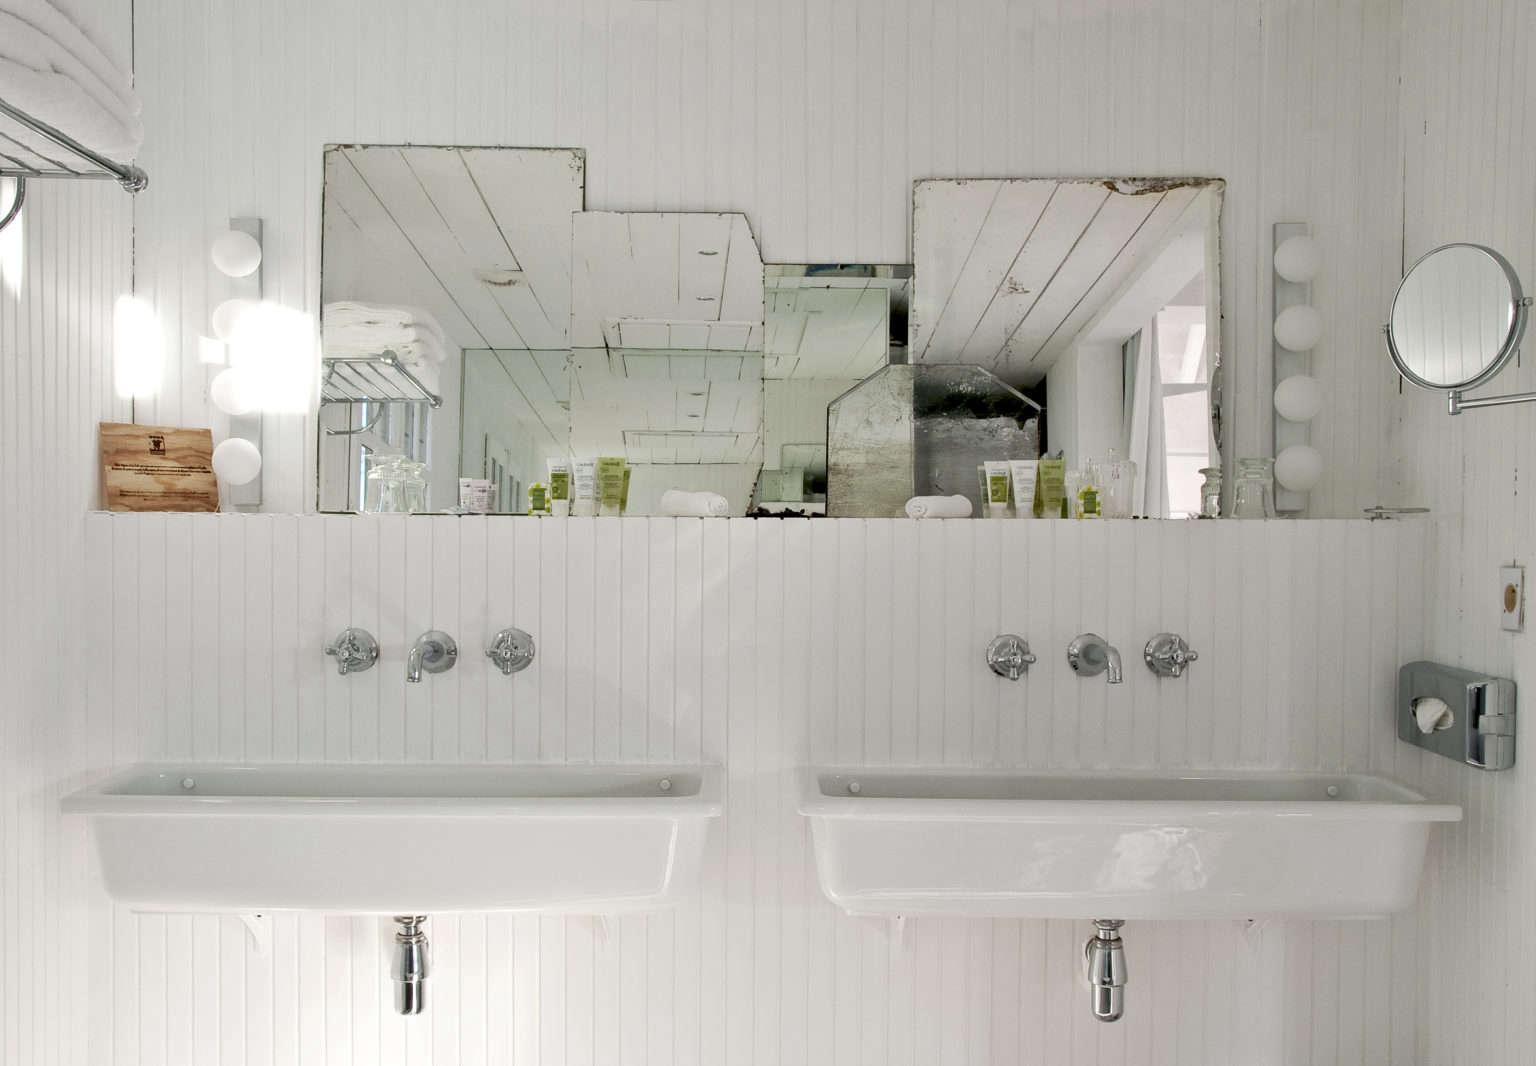 Trend Alert: 11 Deconstructed Baths - The Organized Home